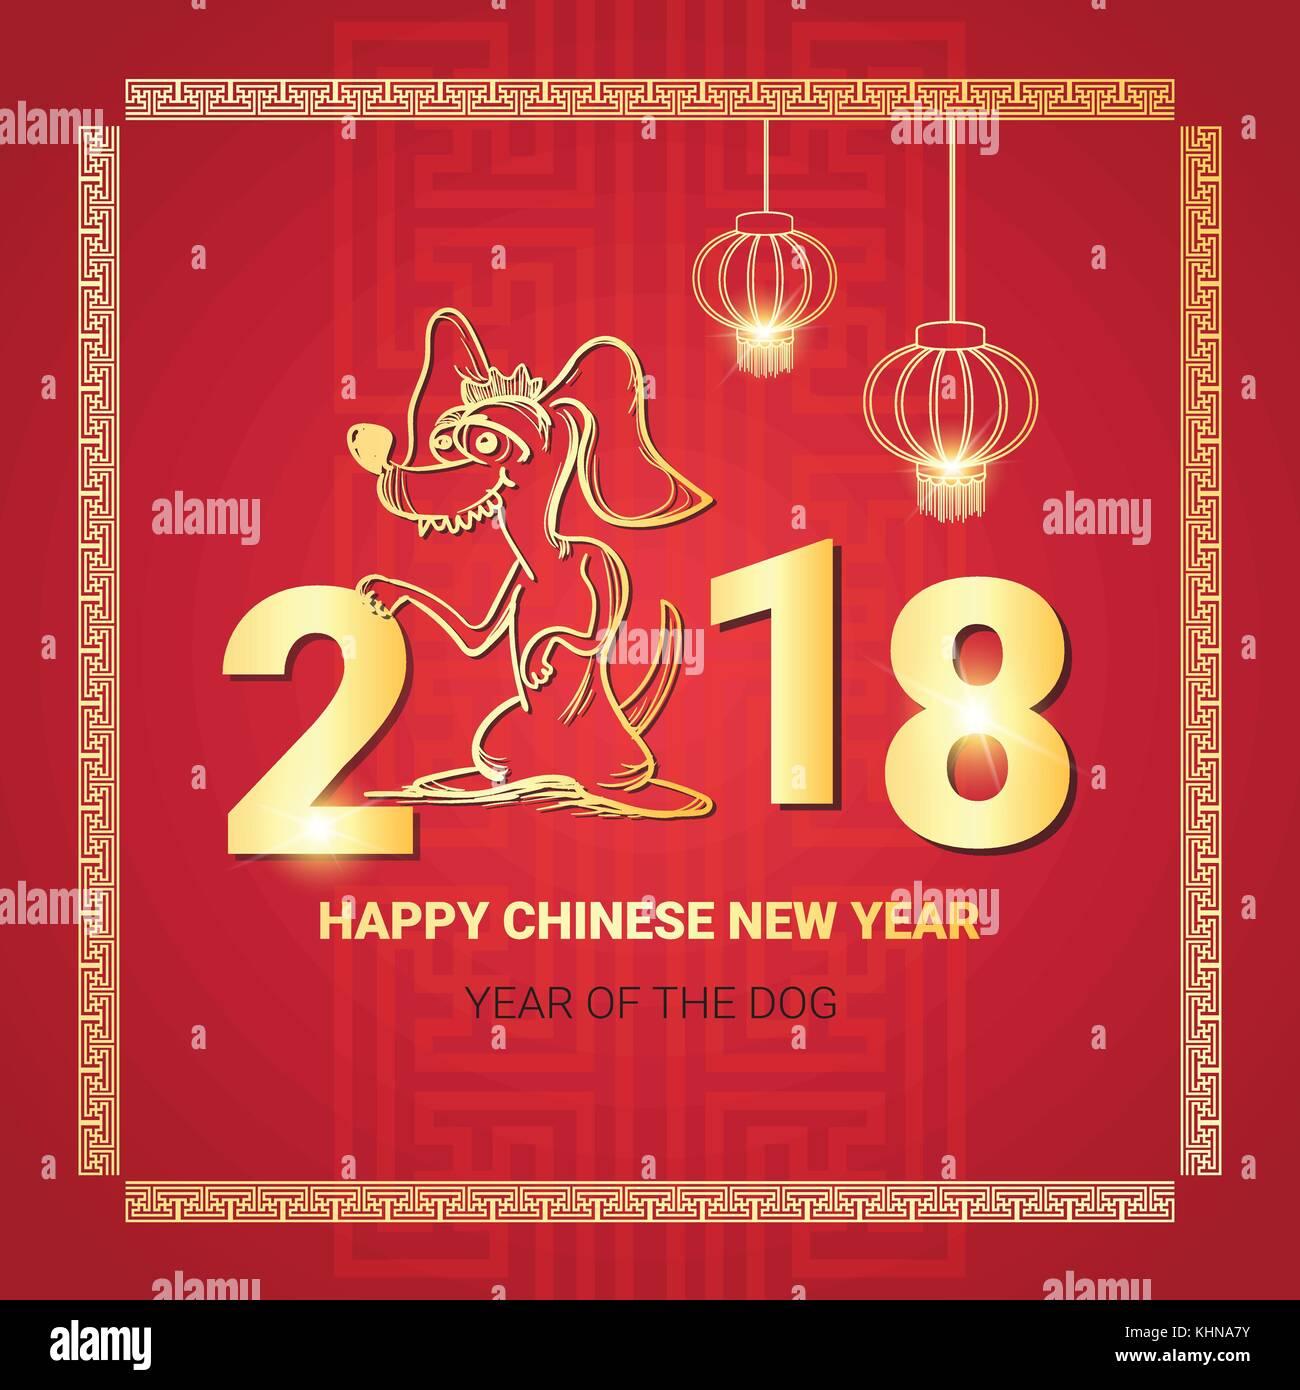 Chinese New Year Greeting Card Kaniwebpa